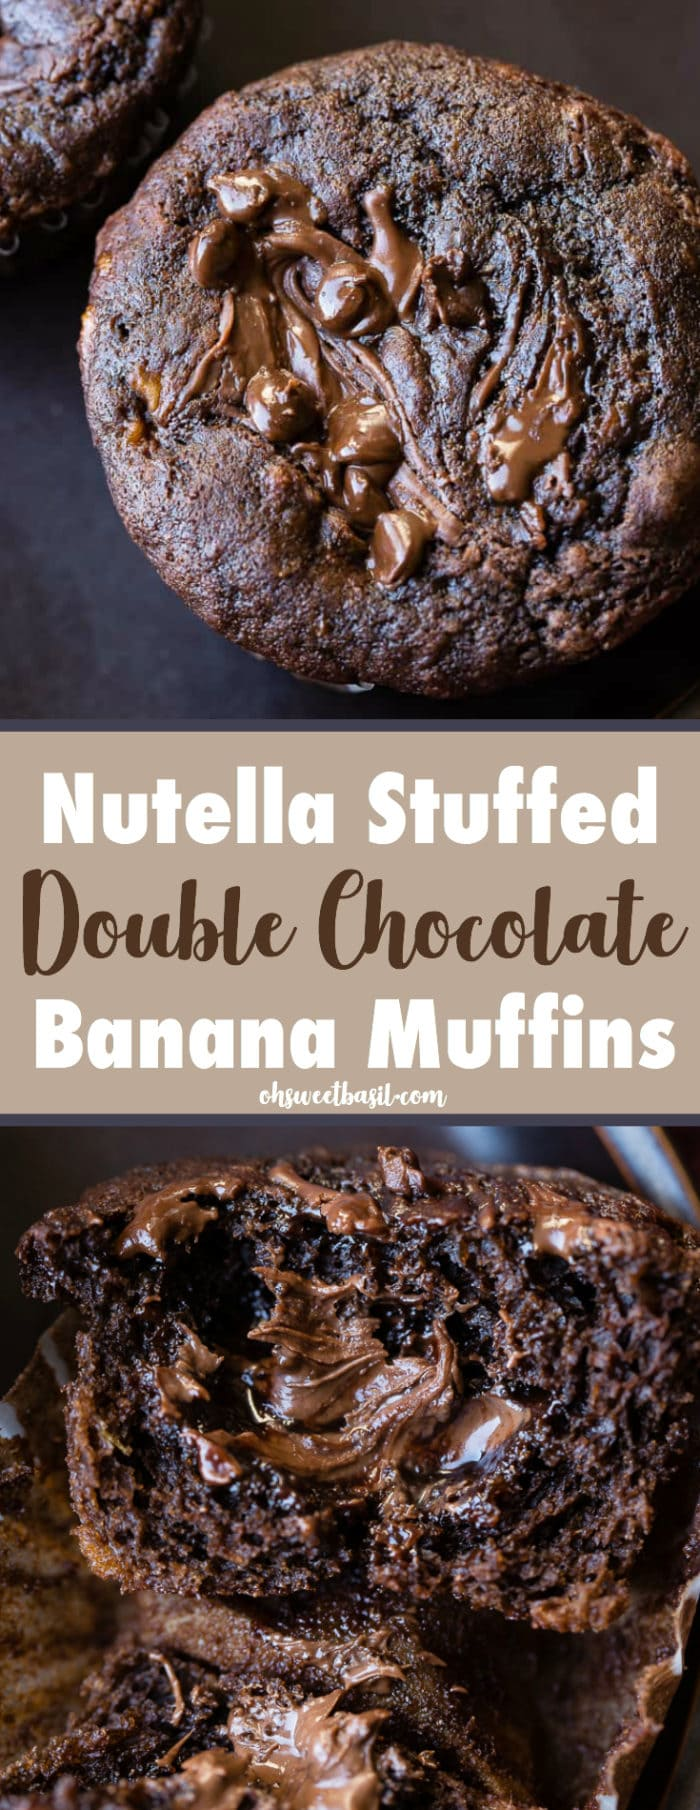 a nutella stuffed double chocolate banana muffin cut in half